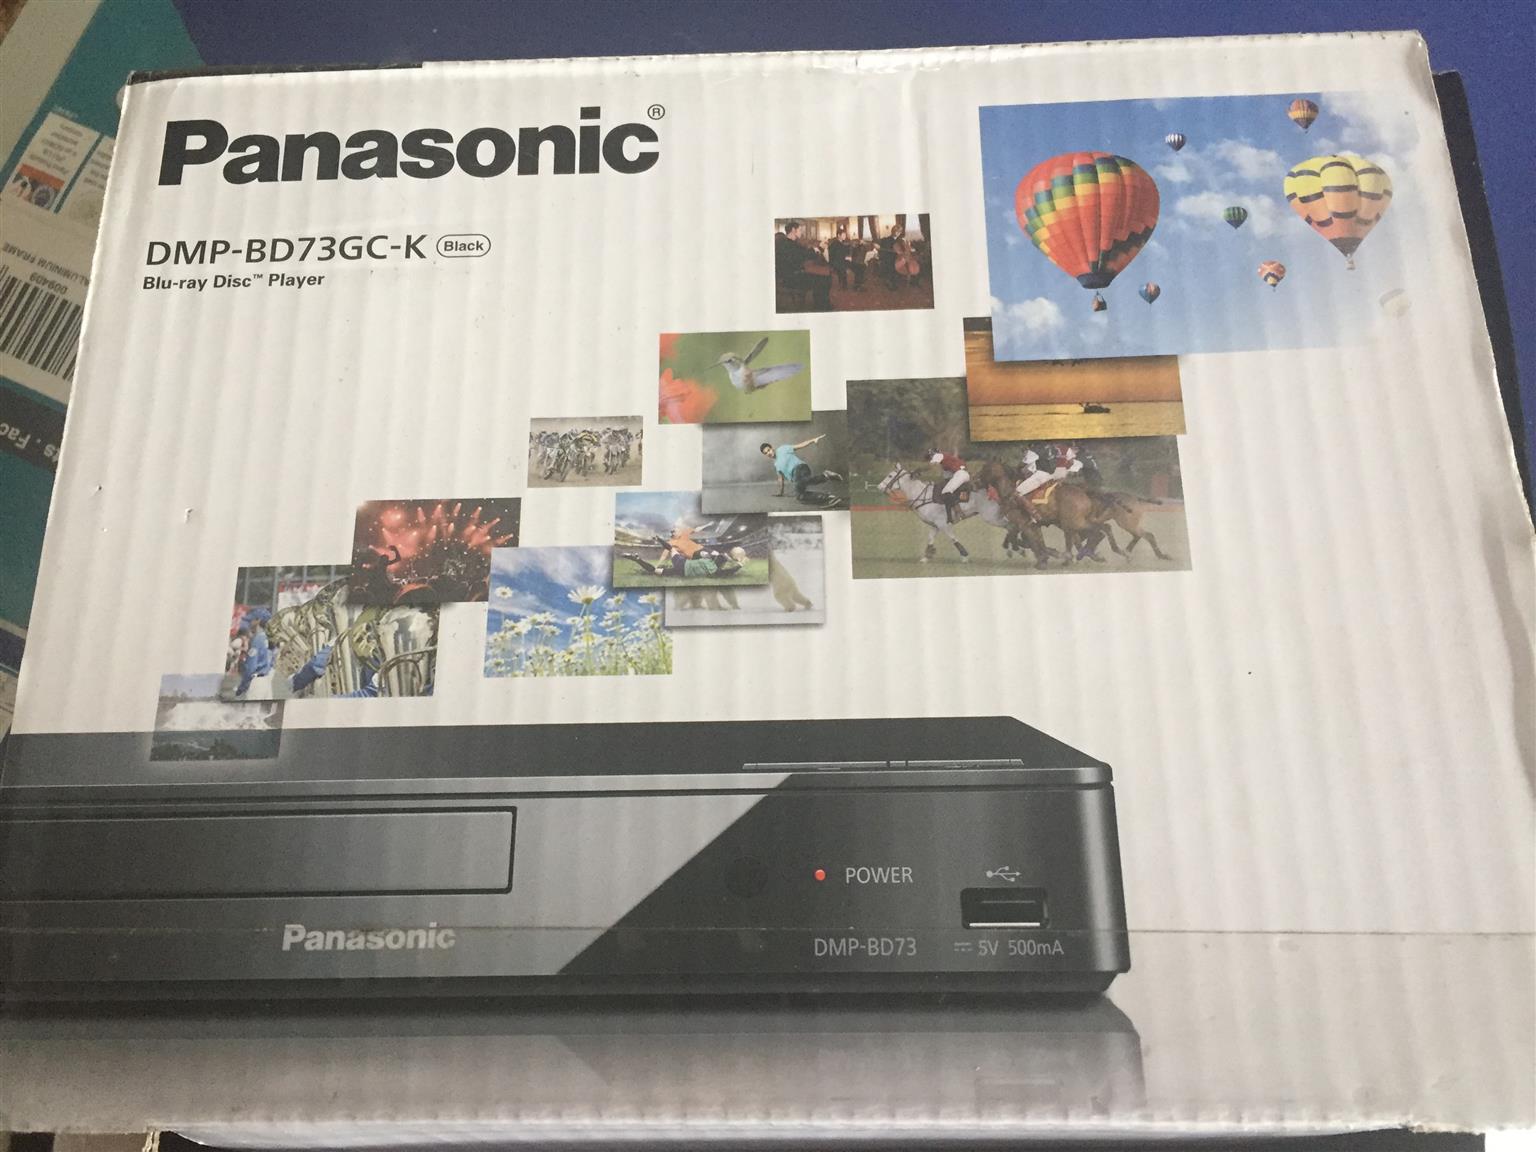 Brand new Panasonic Blue-ray Disk Player DMP-BD73GC-K